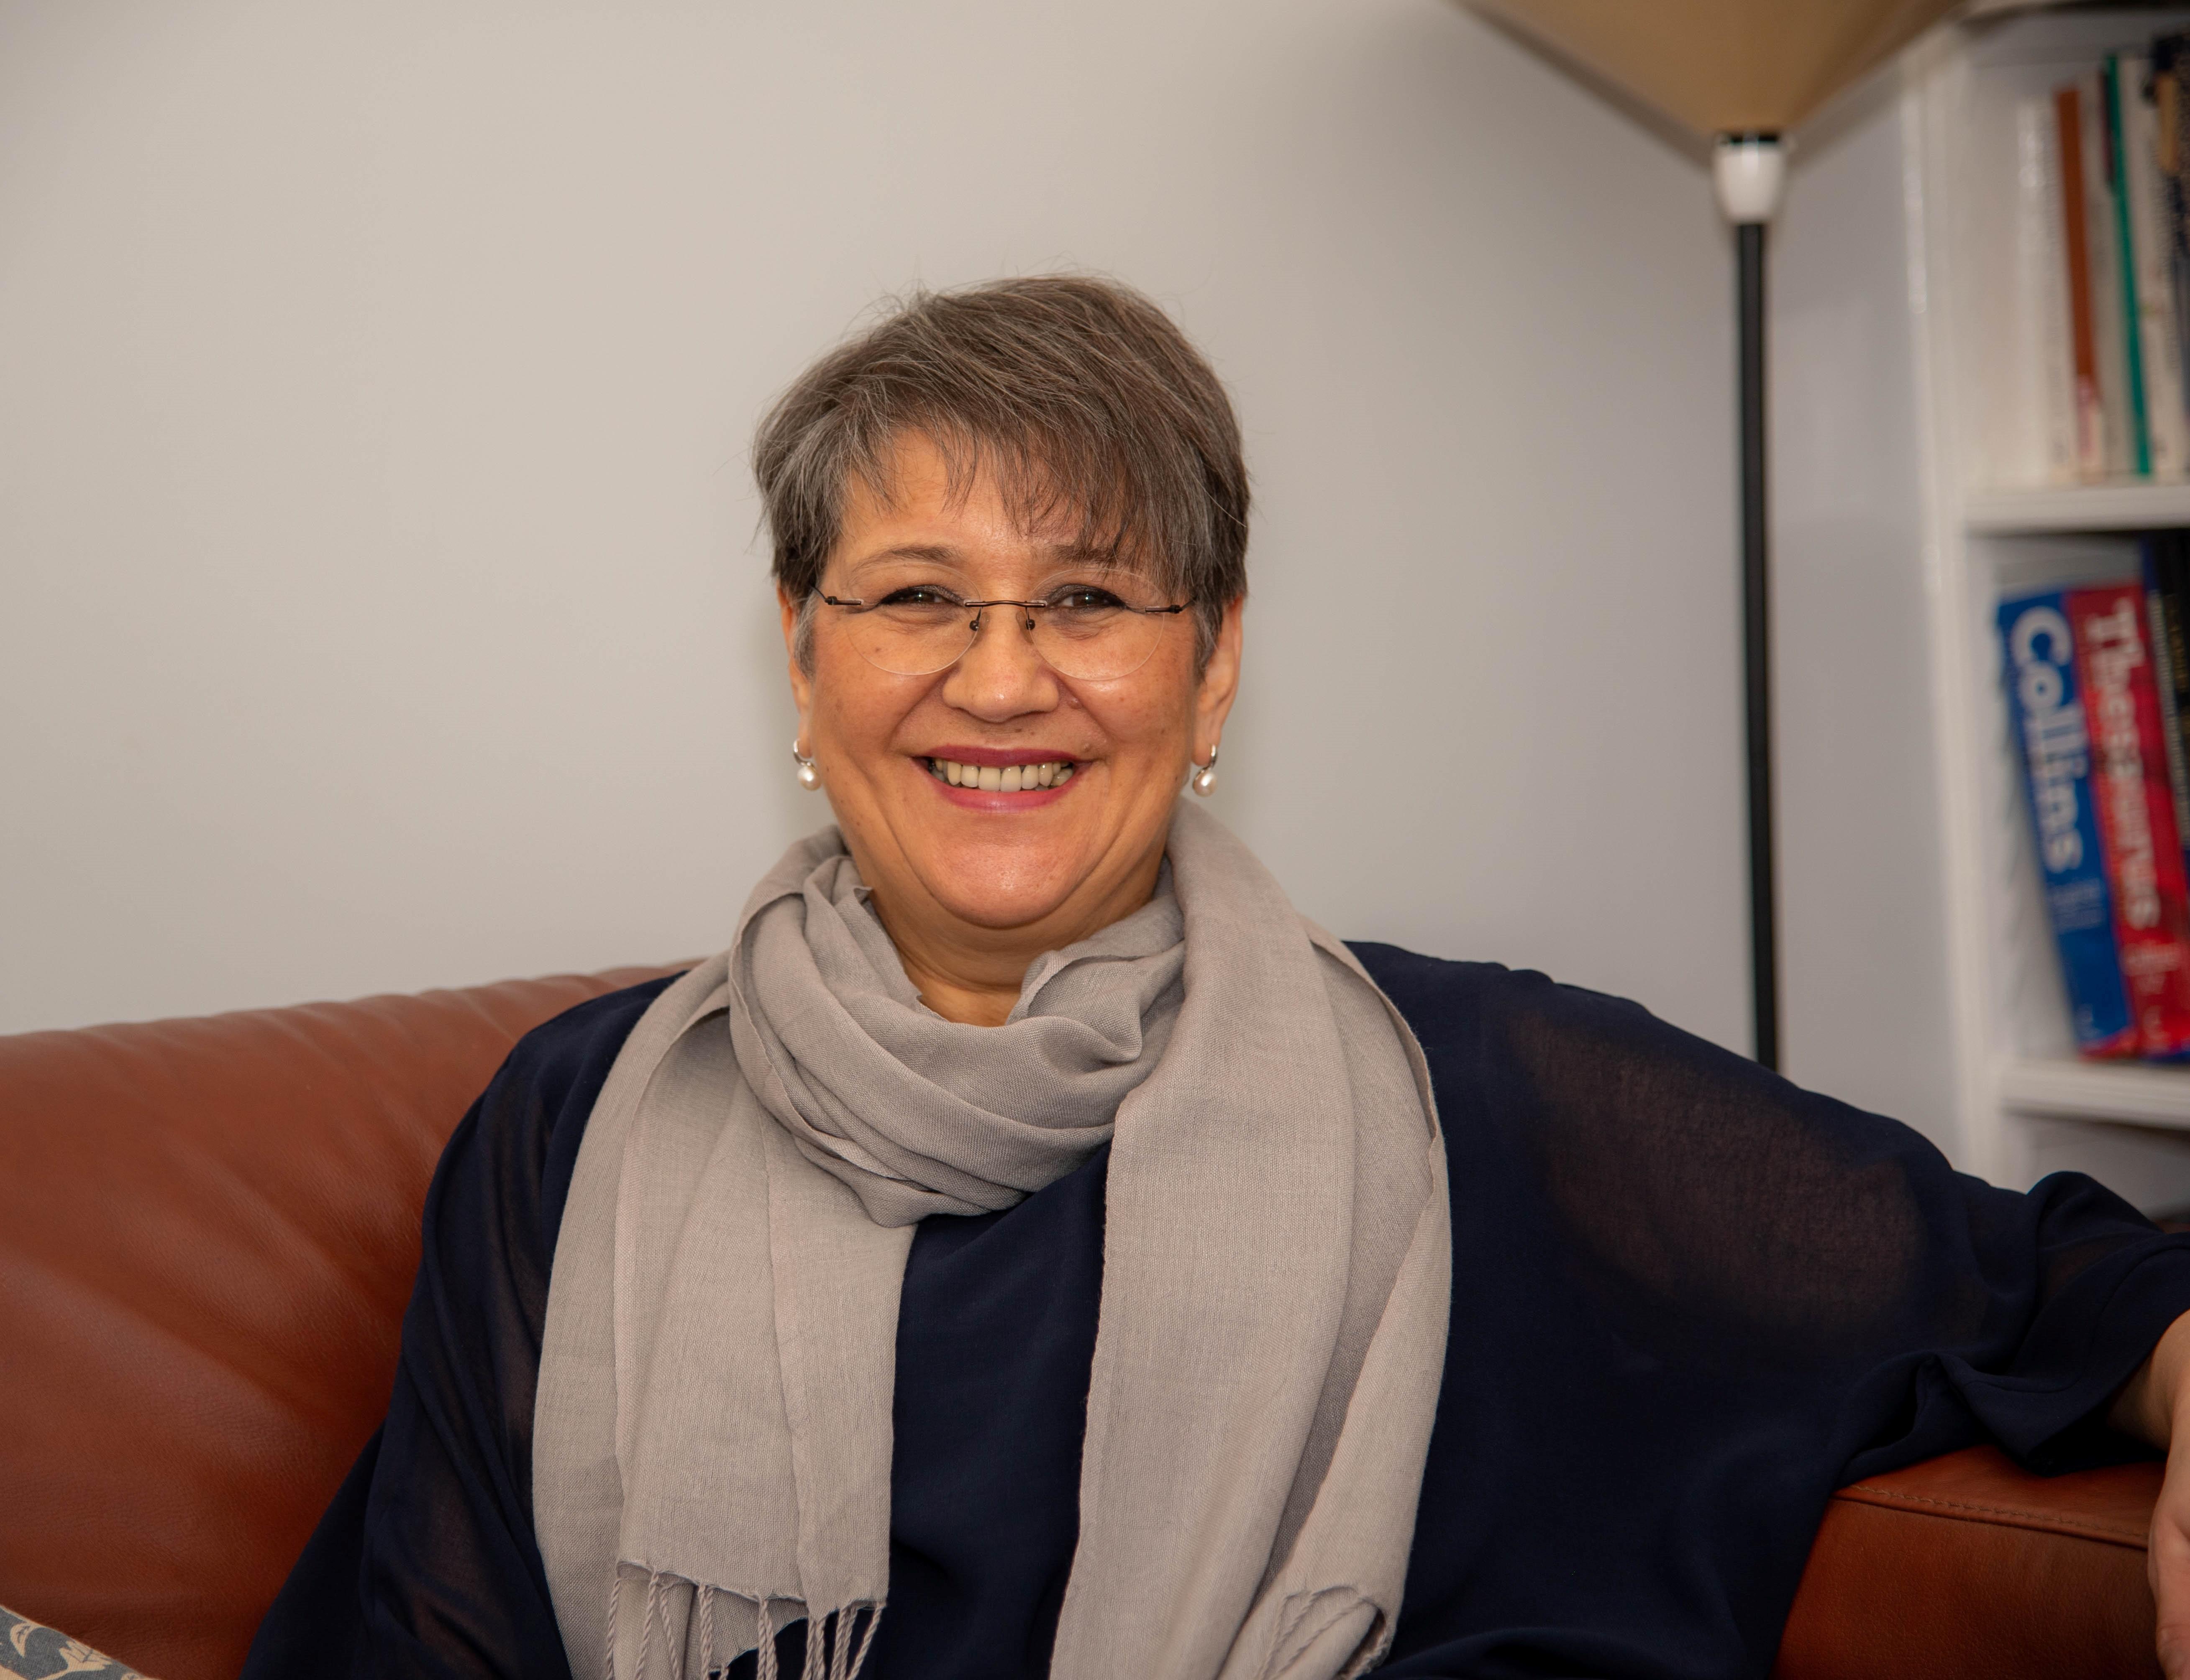 Linda Lawler